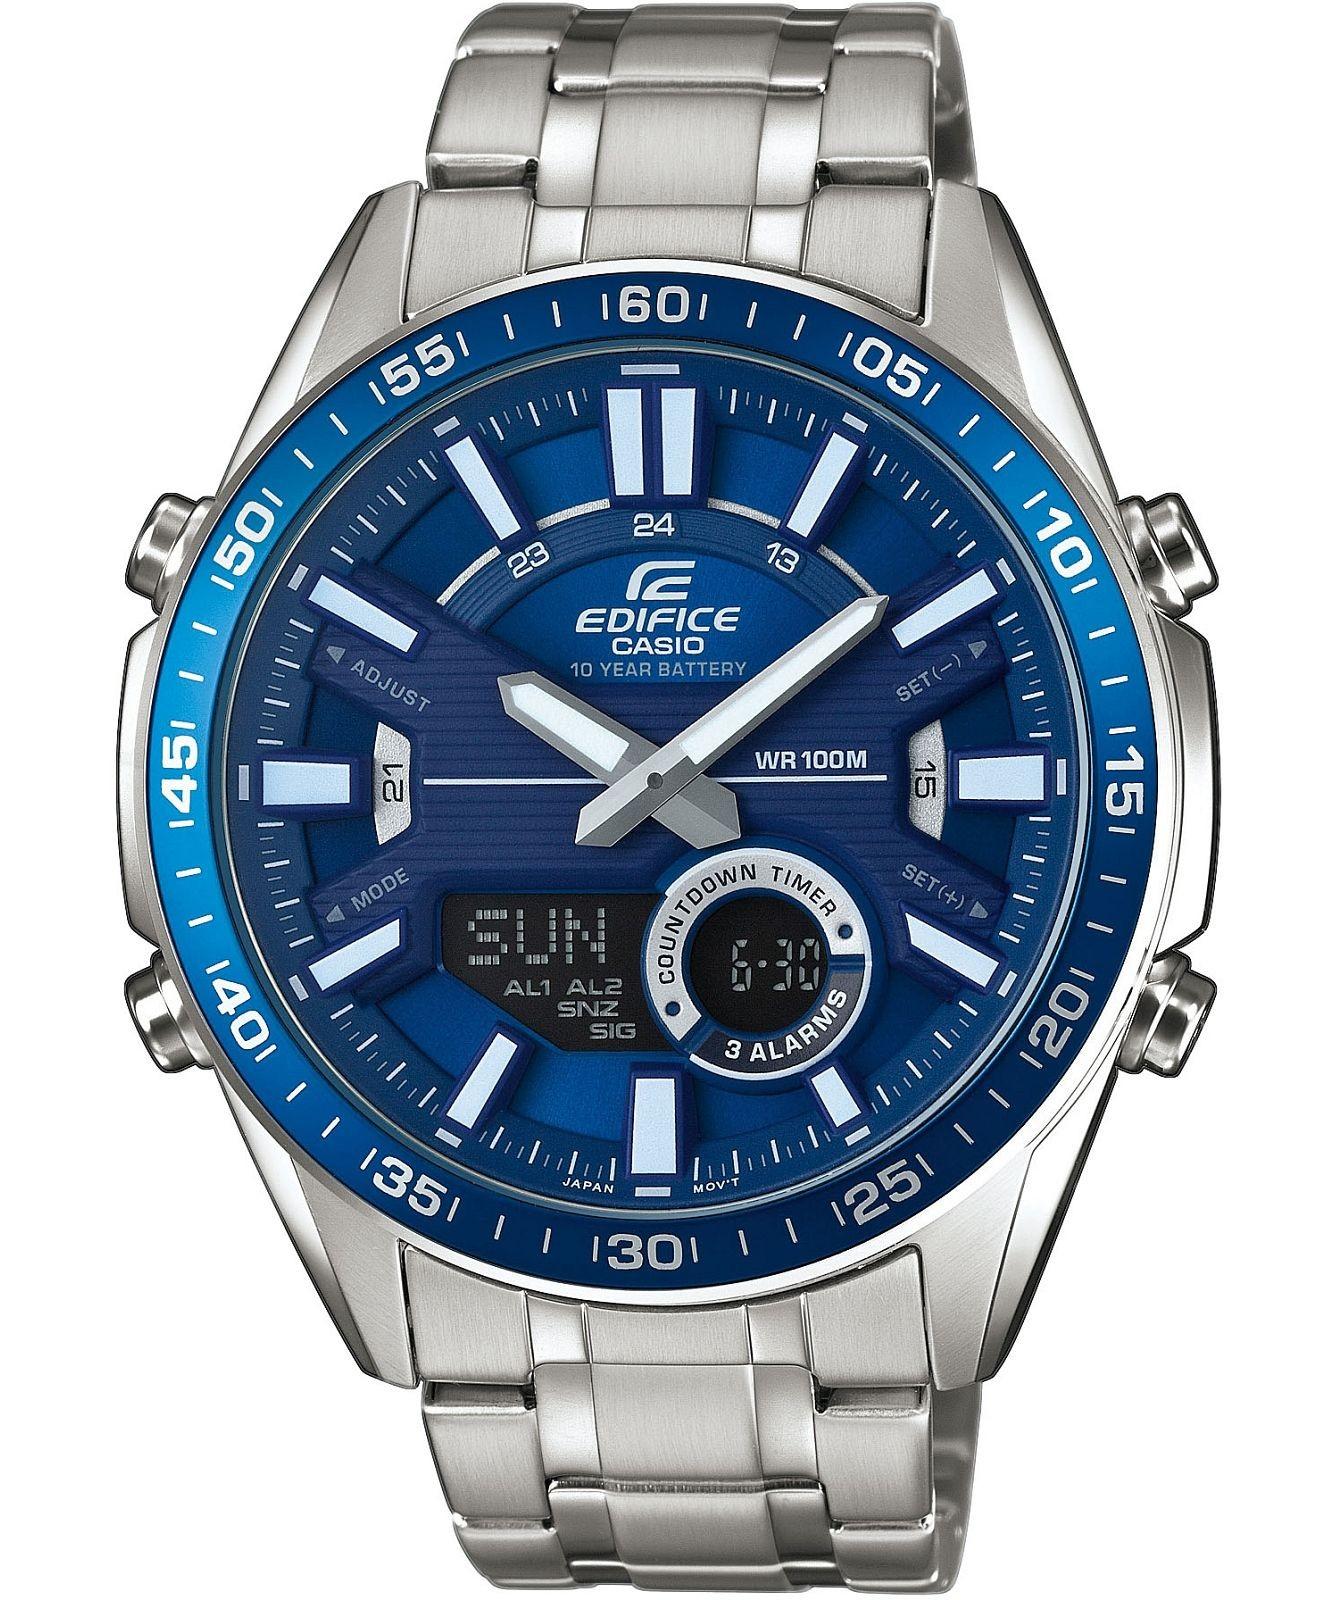 Zegarek męski EDIFICE Momentum Sporty Chronograph @Zegarownia - 10ATM